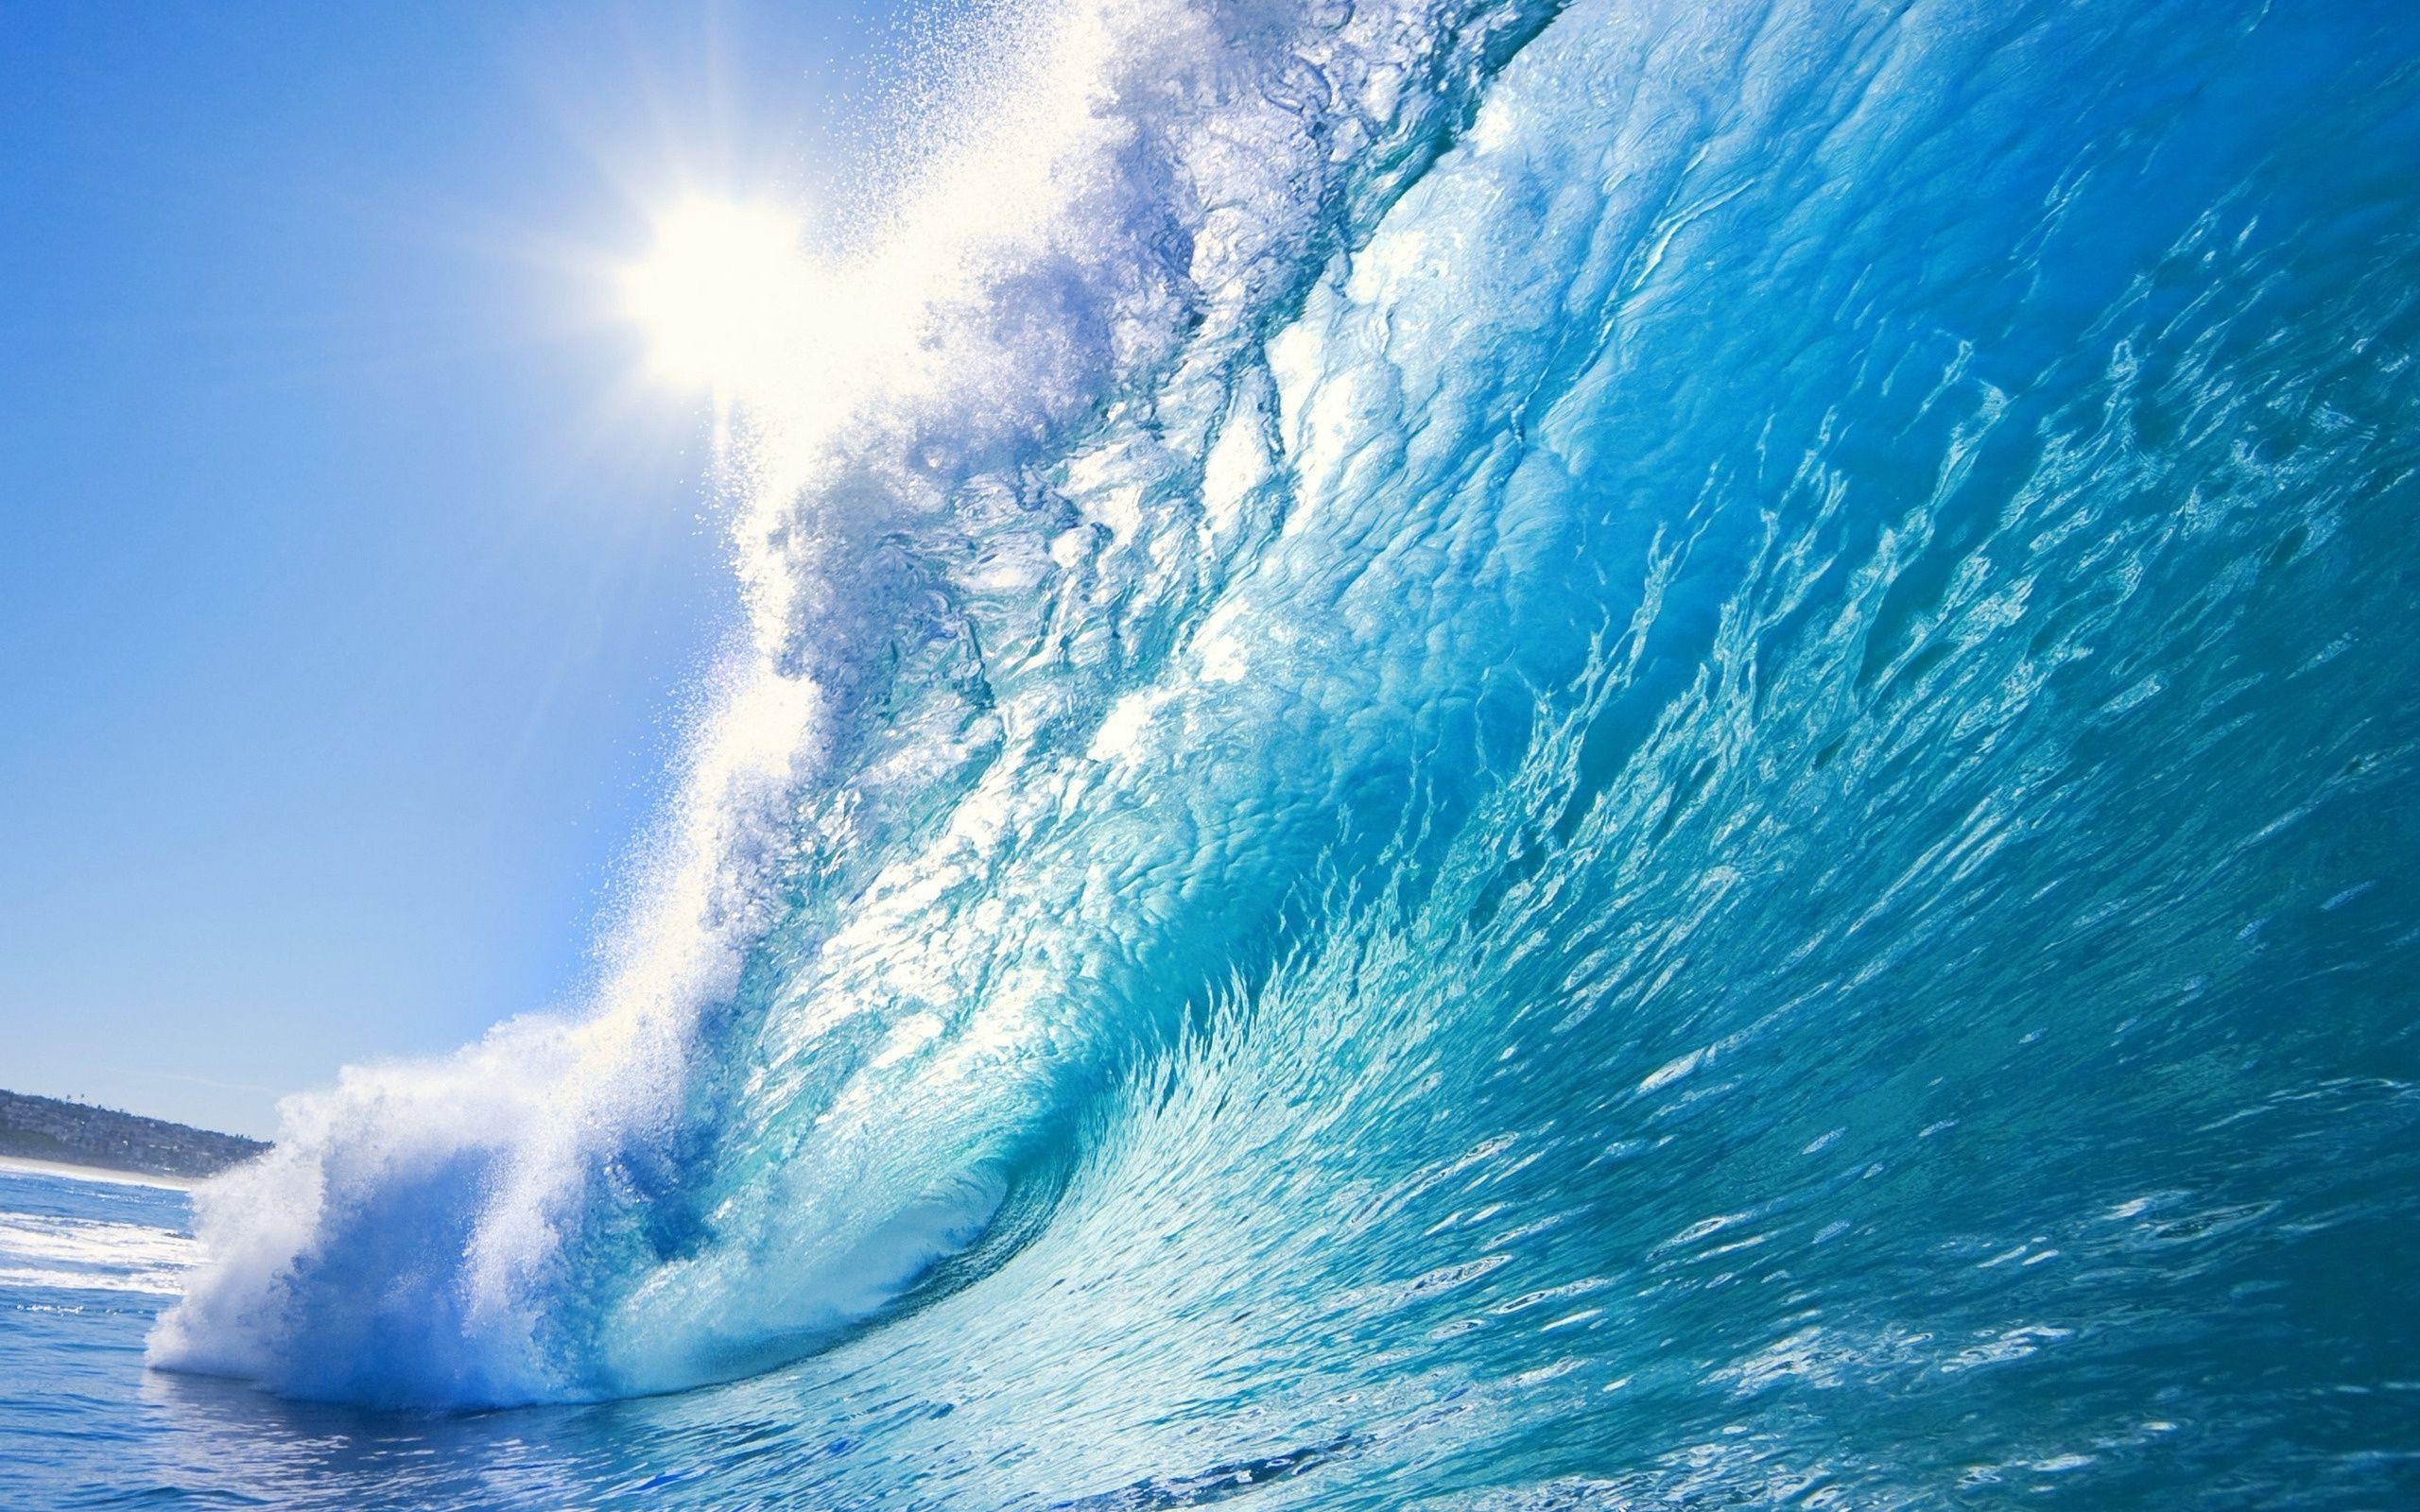 Ocean Waves hd Wallpapers lovely hd desktop background wallpapers of 2560x1600